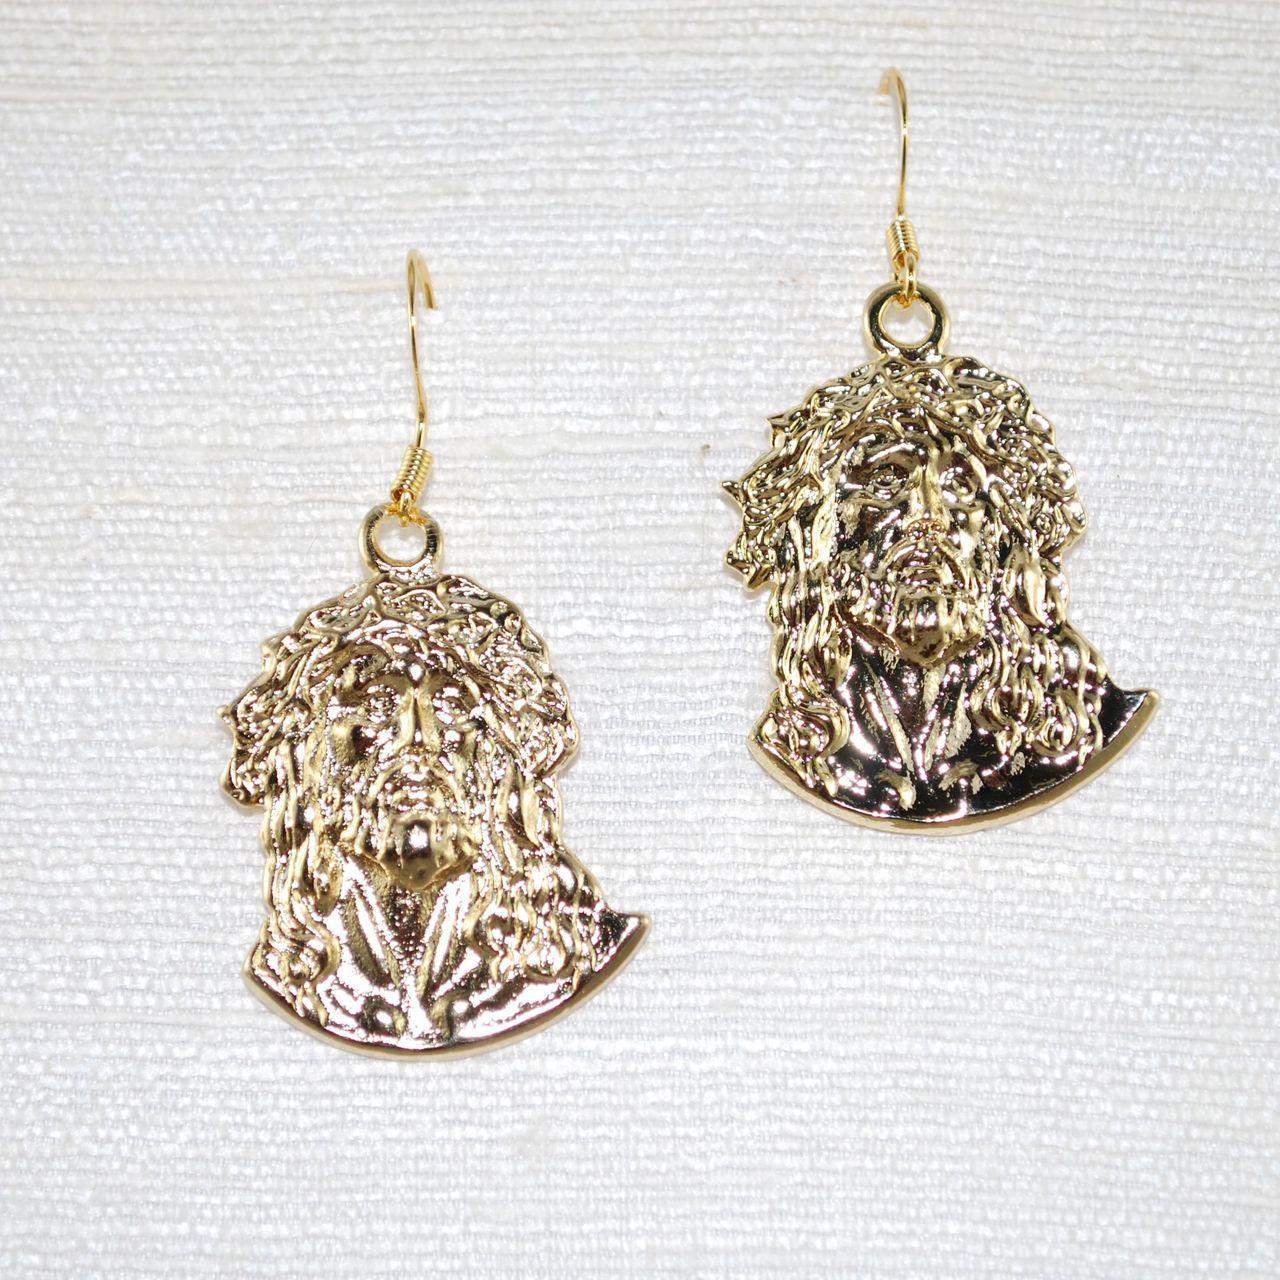 Enchanting Jewelry Creations image 25